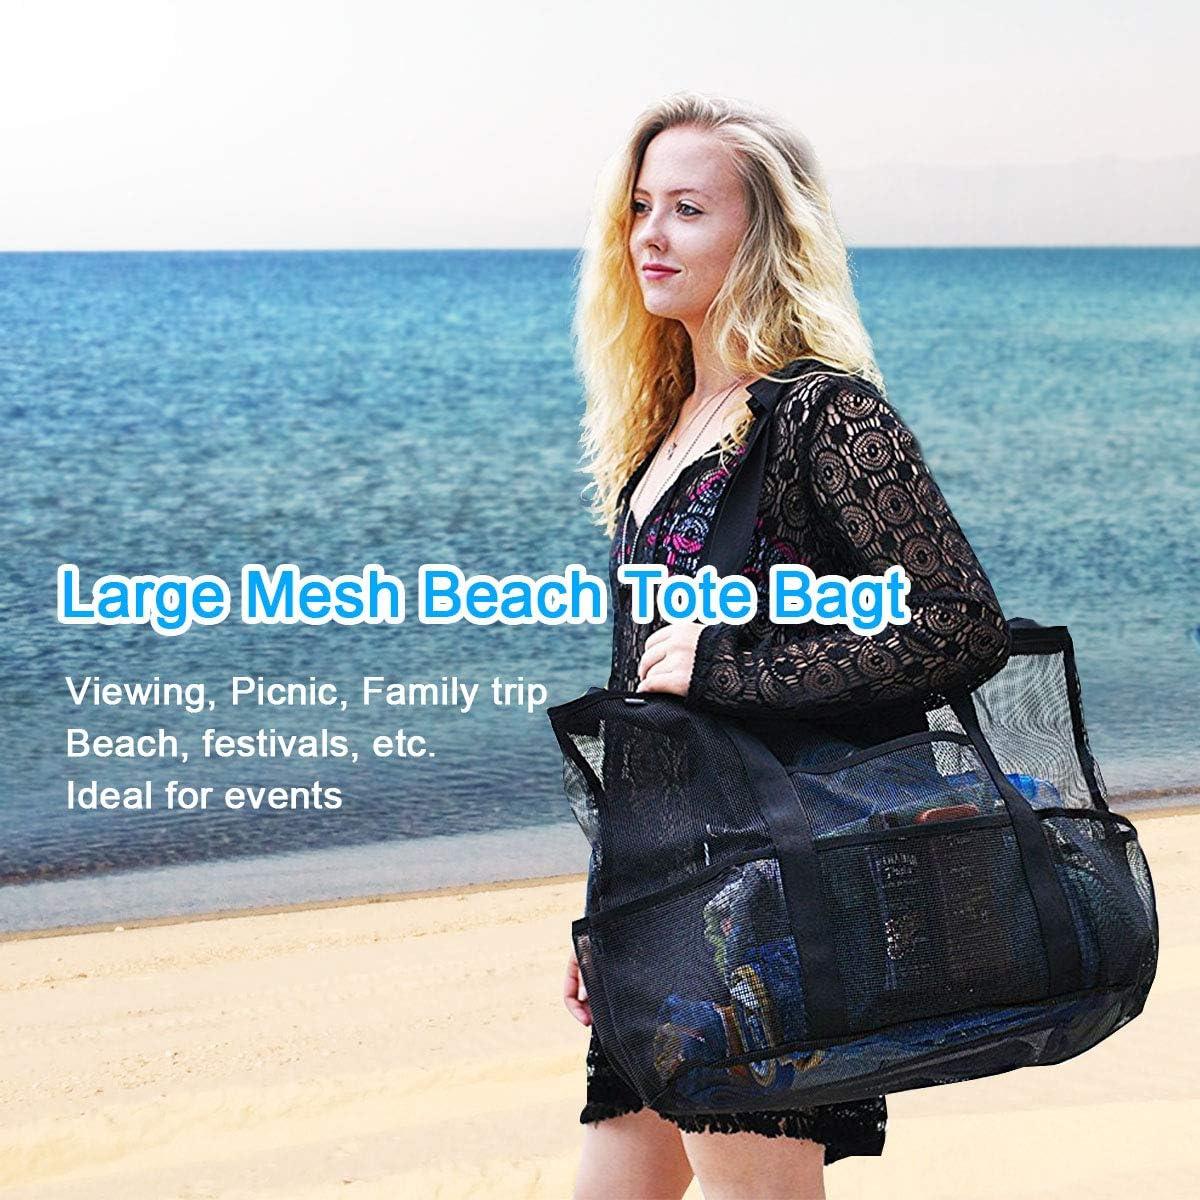 bolsa de hombro multifuncional bolsa de almacenamiento para juguetes liviana plegable reutilizable grande Bolsa de playa de malla bolsa de playa para la familia al aire libre